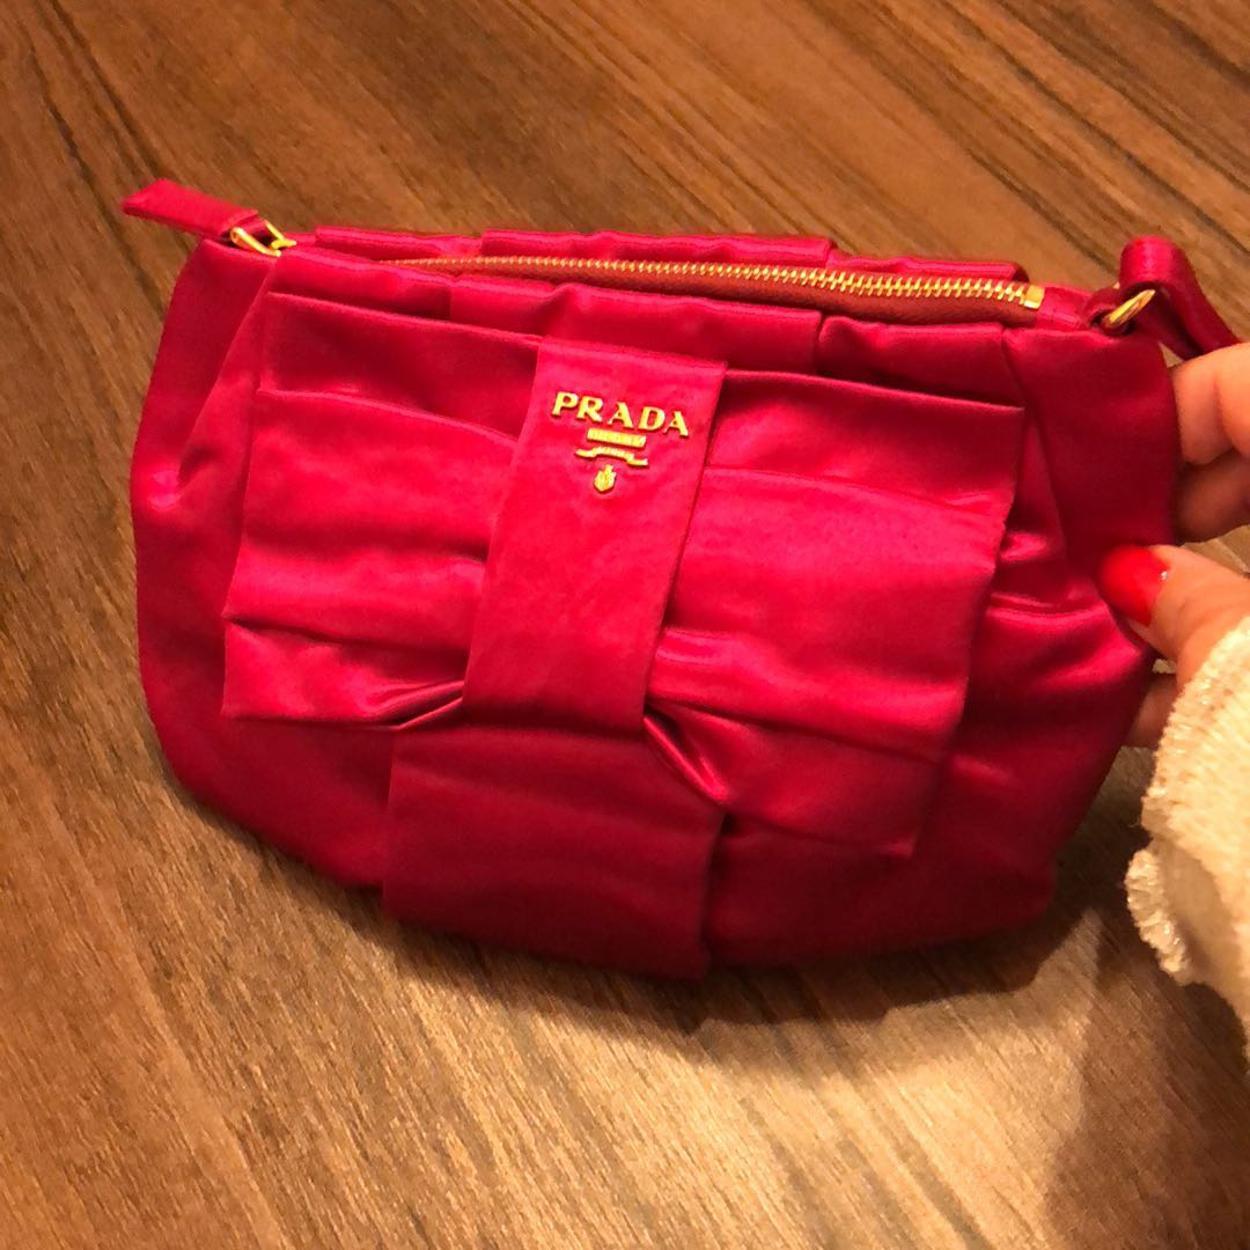 Prada Portföy/El çantası